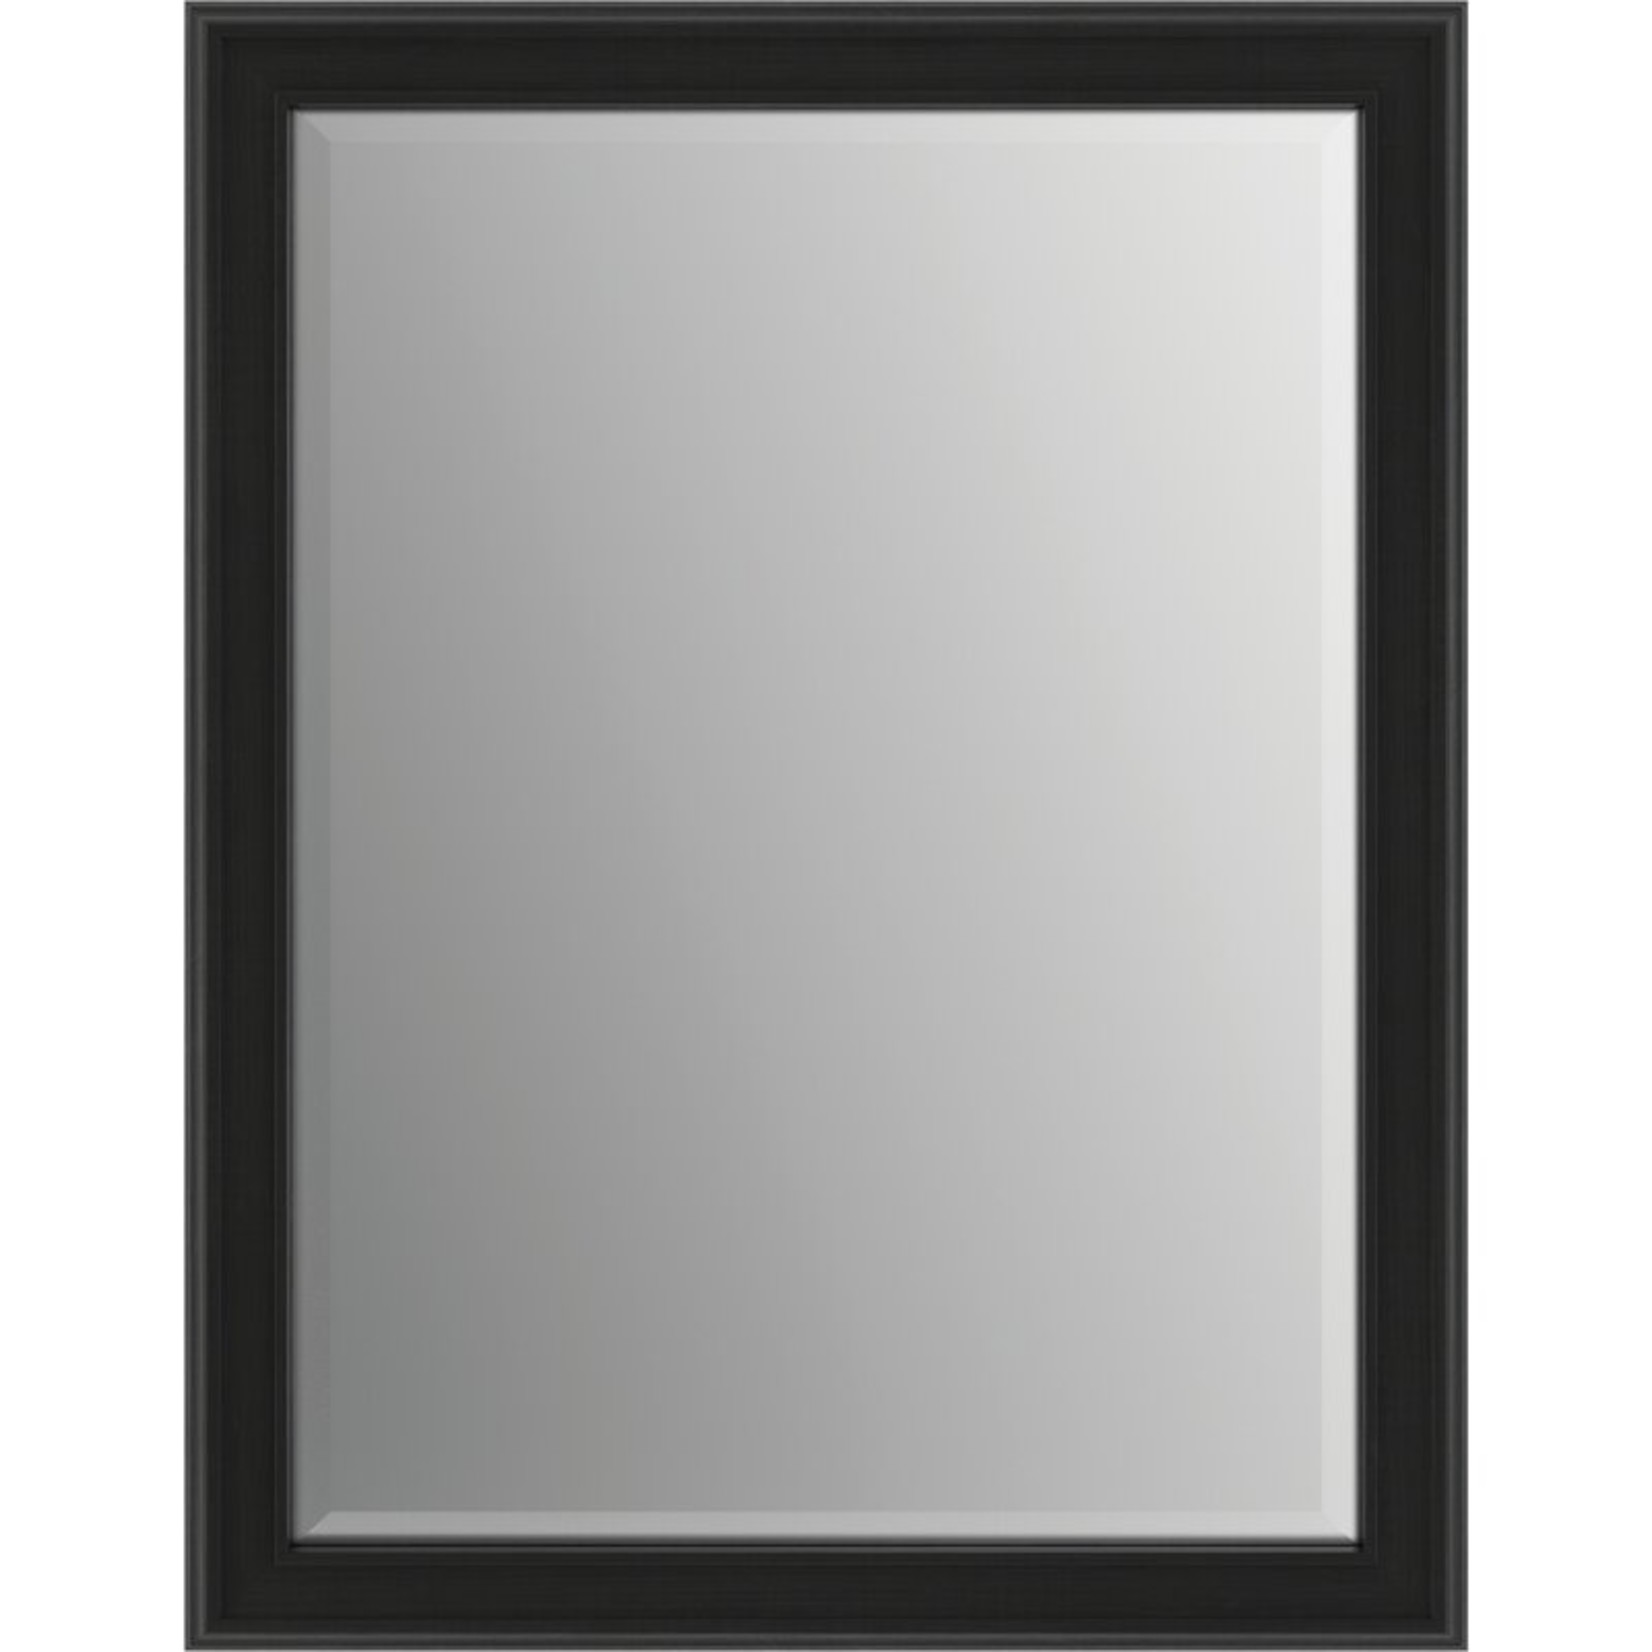 "*24"" x 31"" - Deluxe Modern Beveled Bathroom/Vanity Mirror with Matte Black Frame"